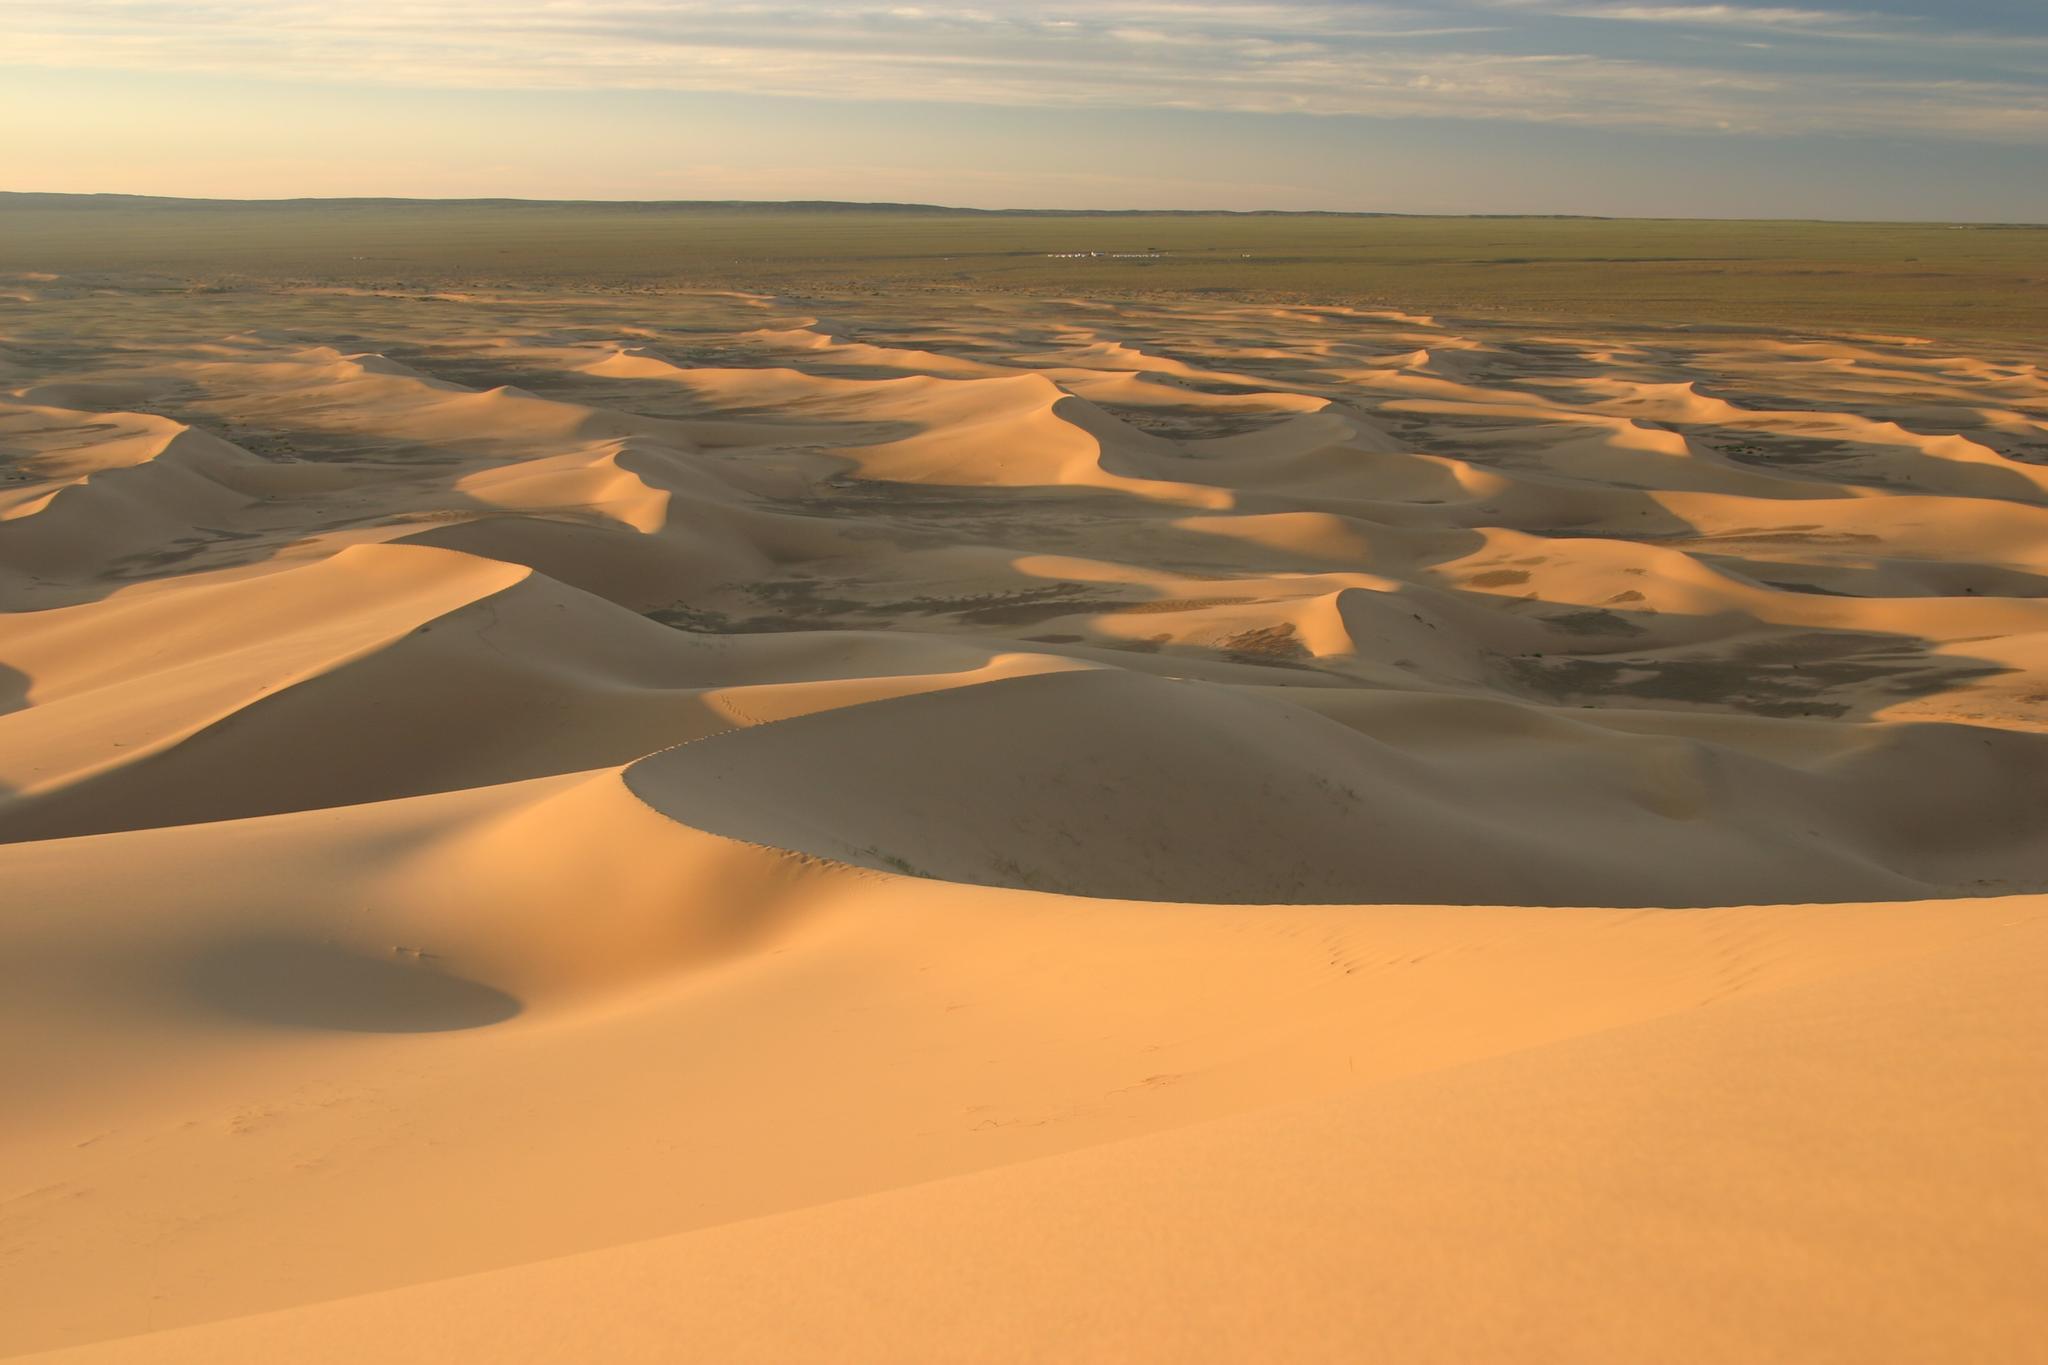 Khongoryn Els-Gobi Desert in Mongolia. Both a literal, and food desert